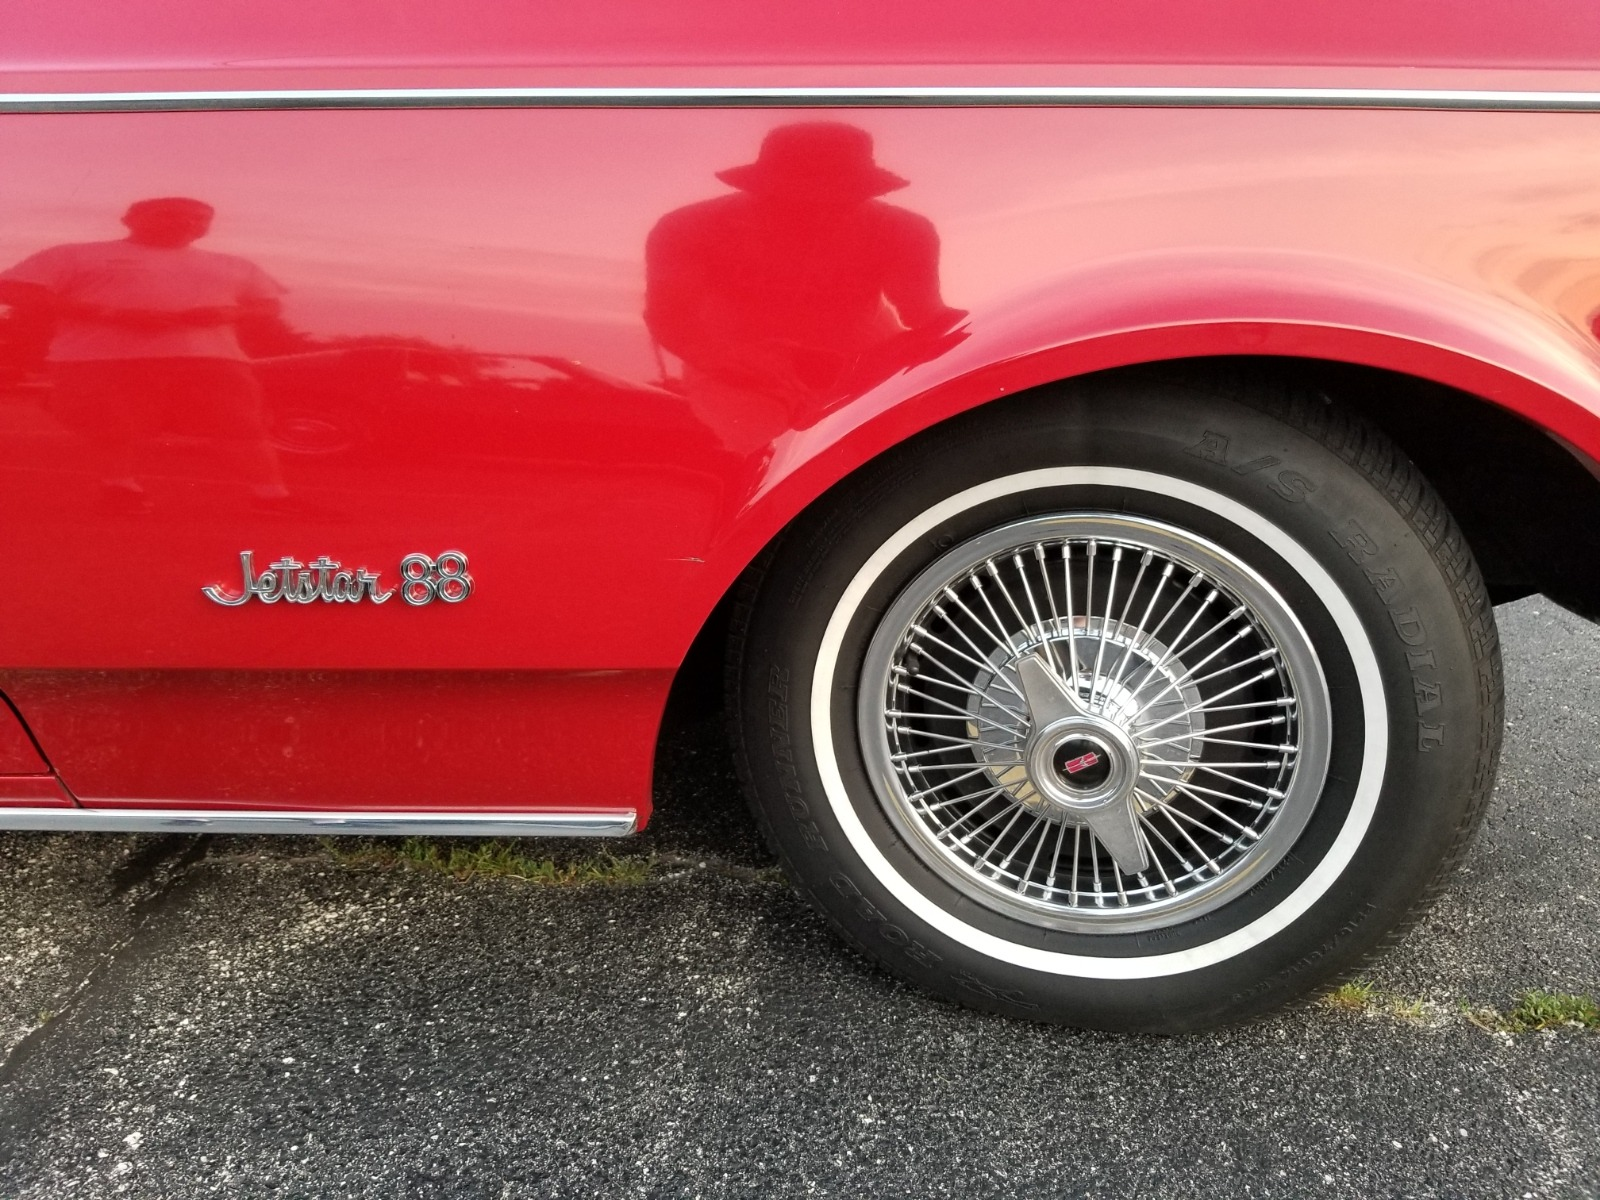 Used 1965 Oldsmobile Jet Star 88 -NICE CLASSIC VINTAGE VEHICLE- | Mundelein, IL